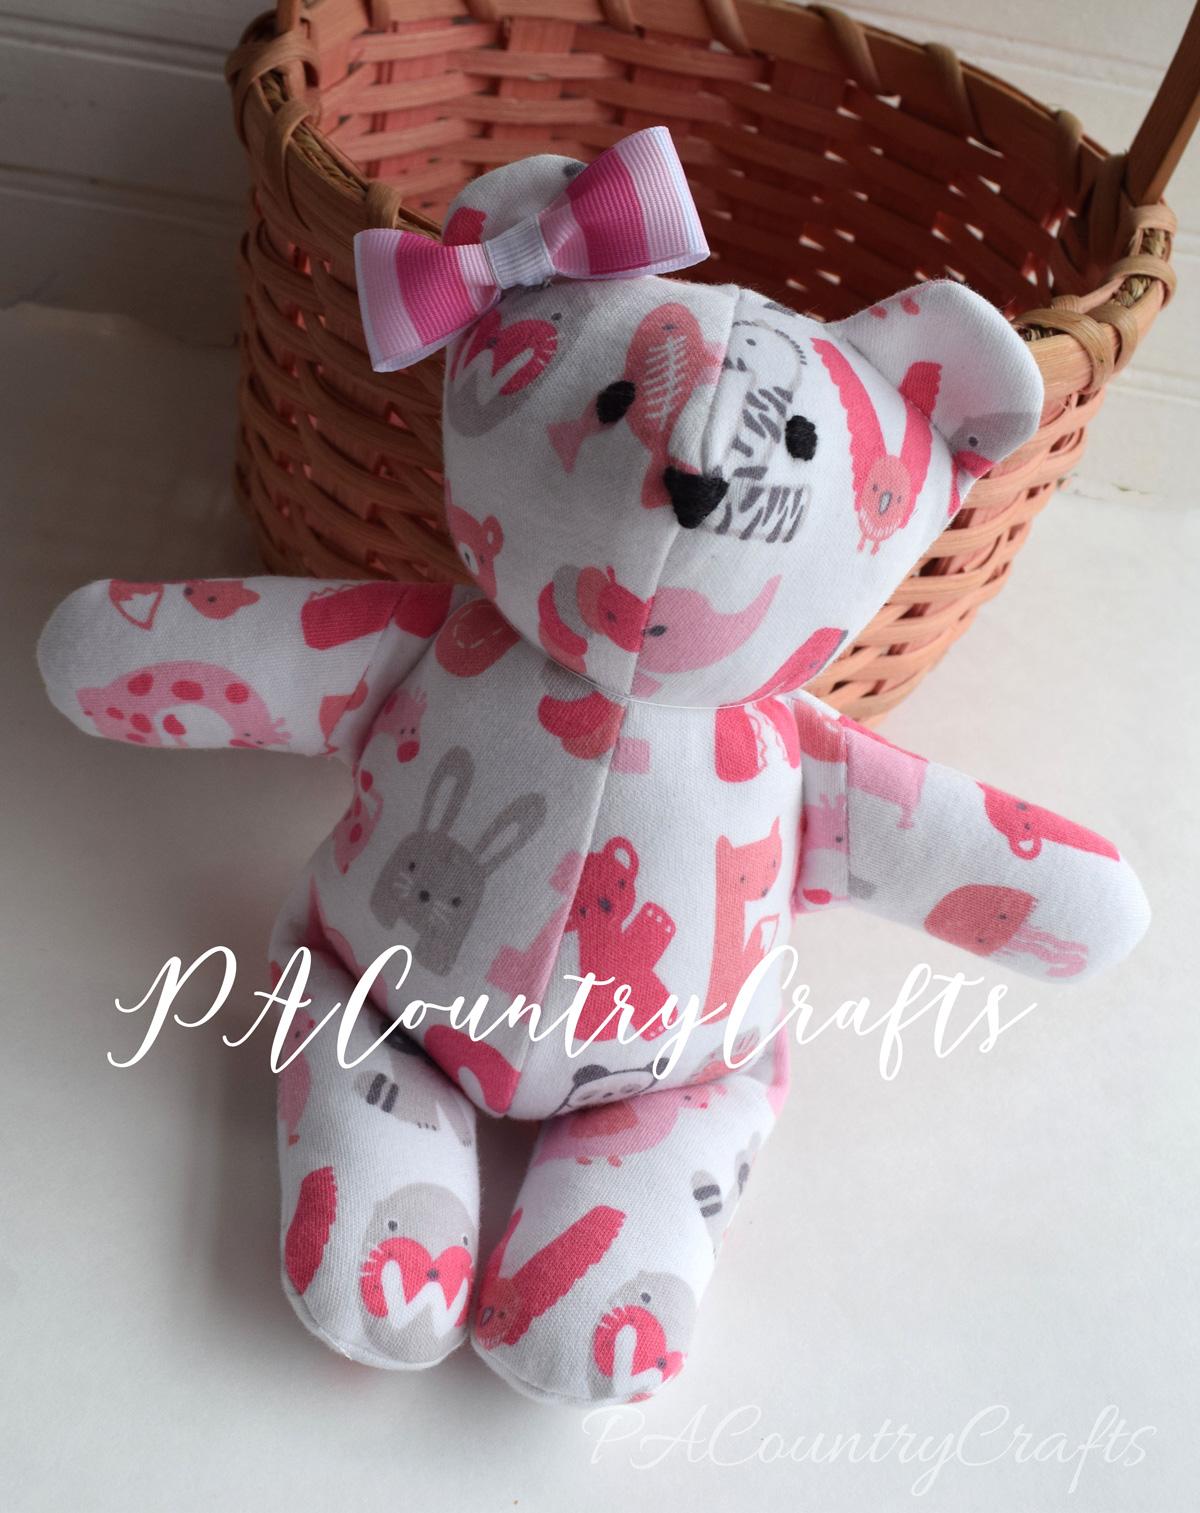 Use old baby sleeper to make a memory bear